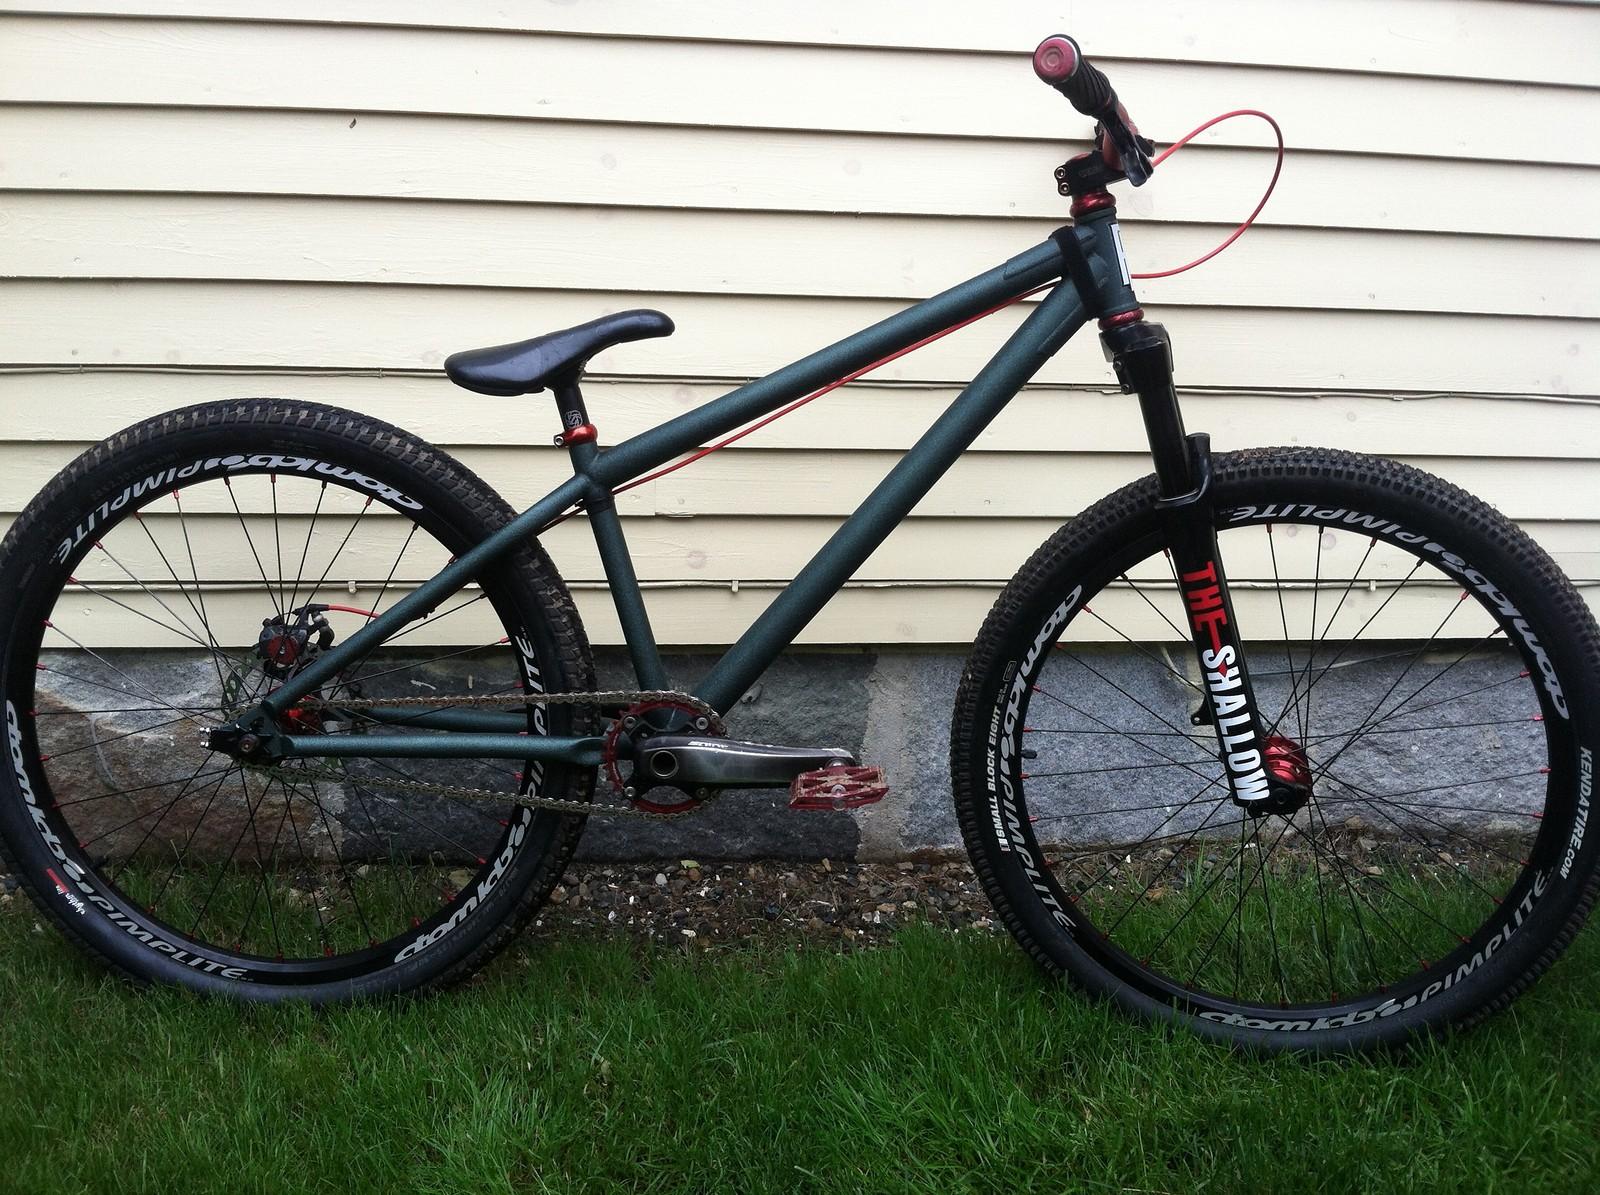 Dirt Jumper - DaddyWhite - Mountain Biking Pictures - Vital MTB